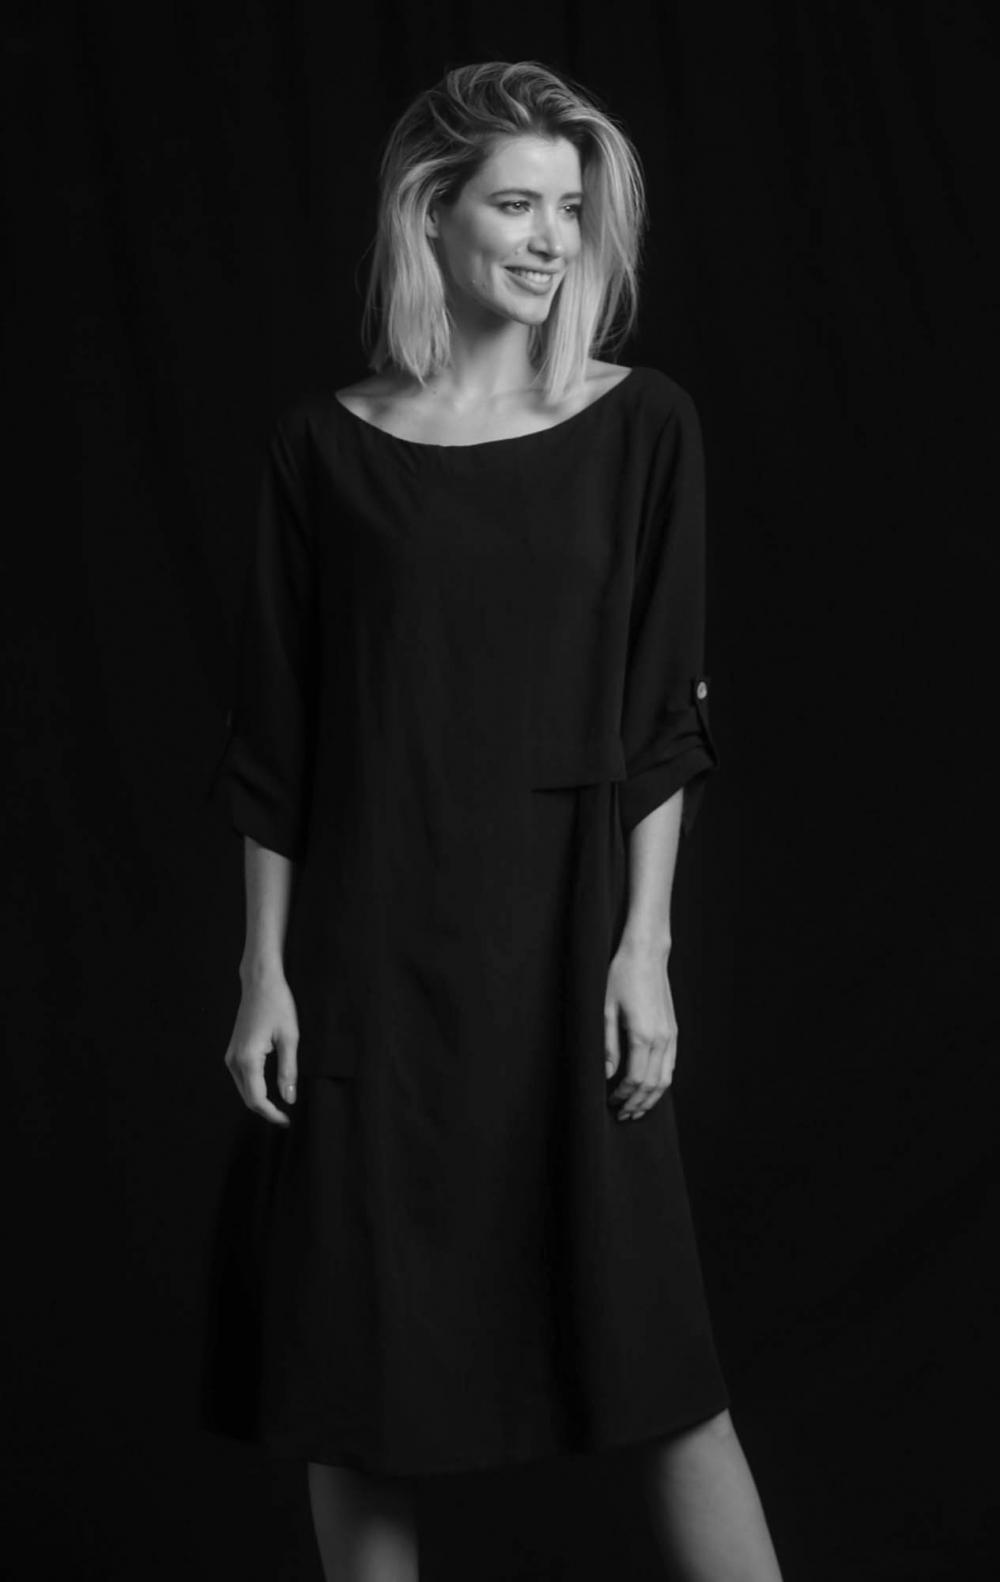 Vestido Linho Recortes Preto - Foto 1